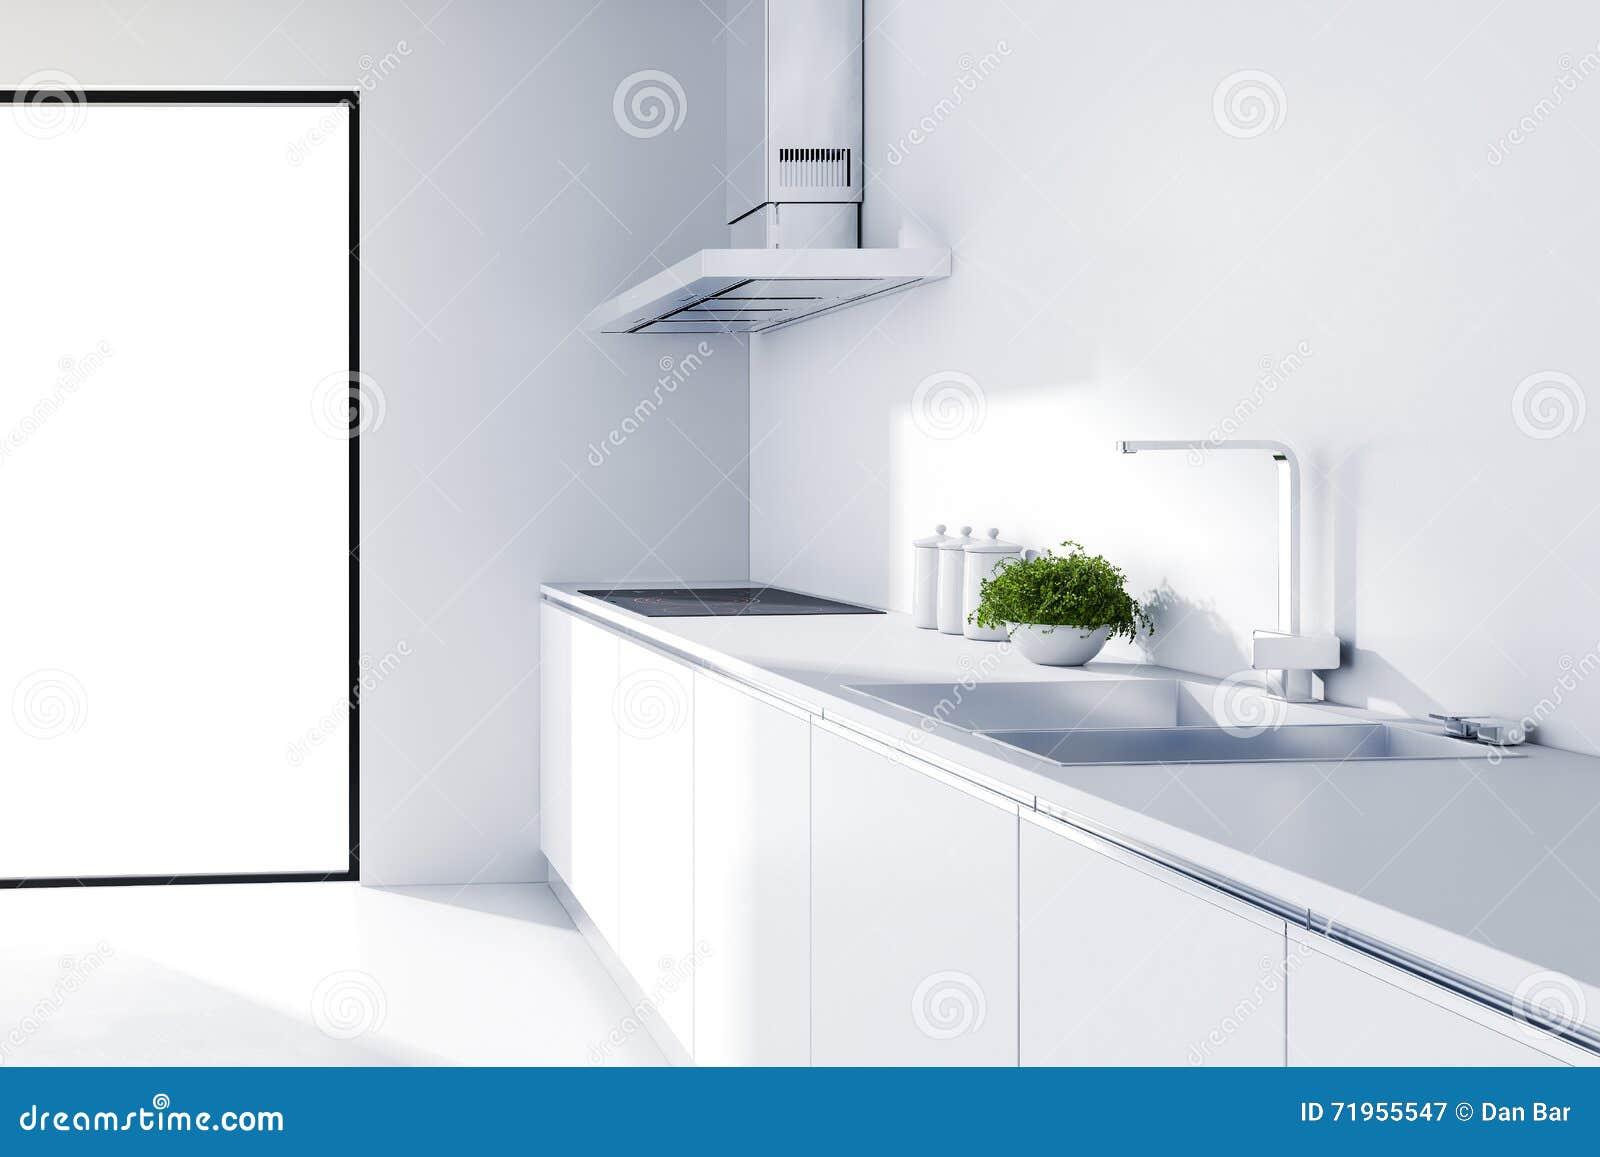 Keuken rood meubilair baas - Afbeelding moderne keuken ...